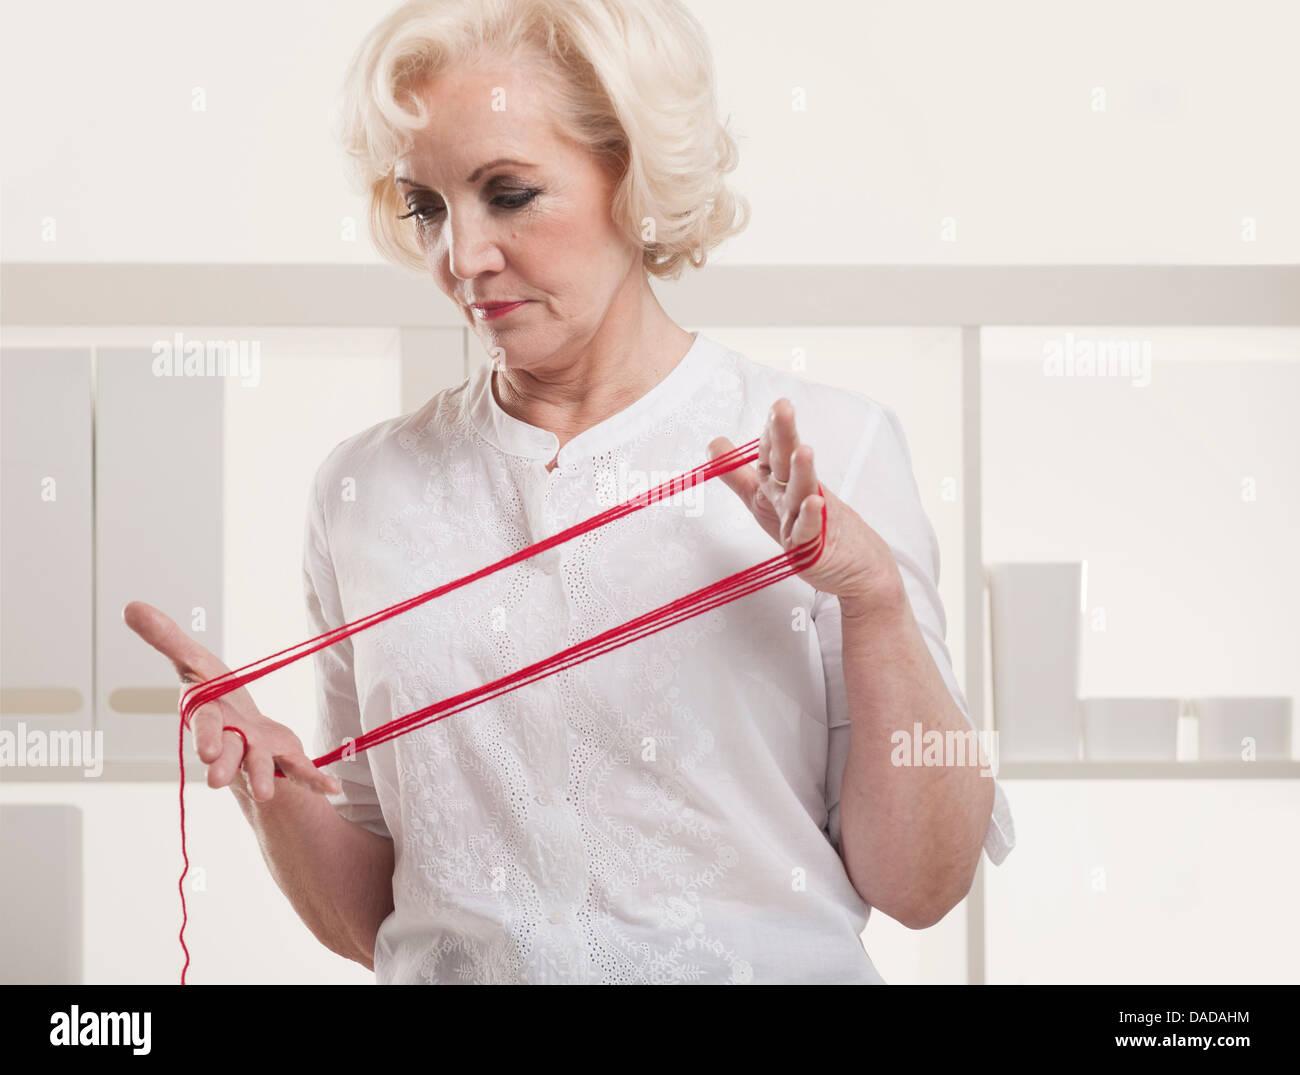 Senior woman winding yarn - Stock Image